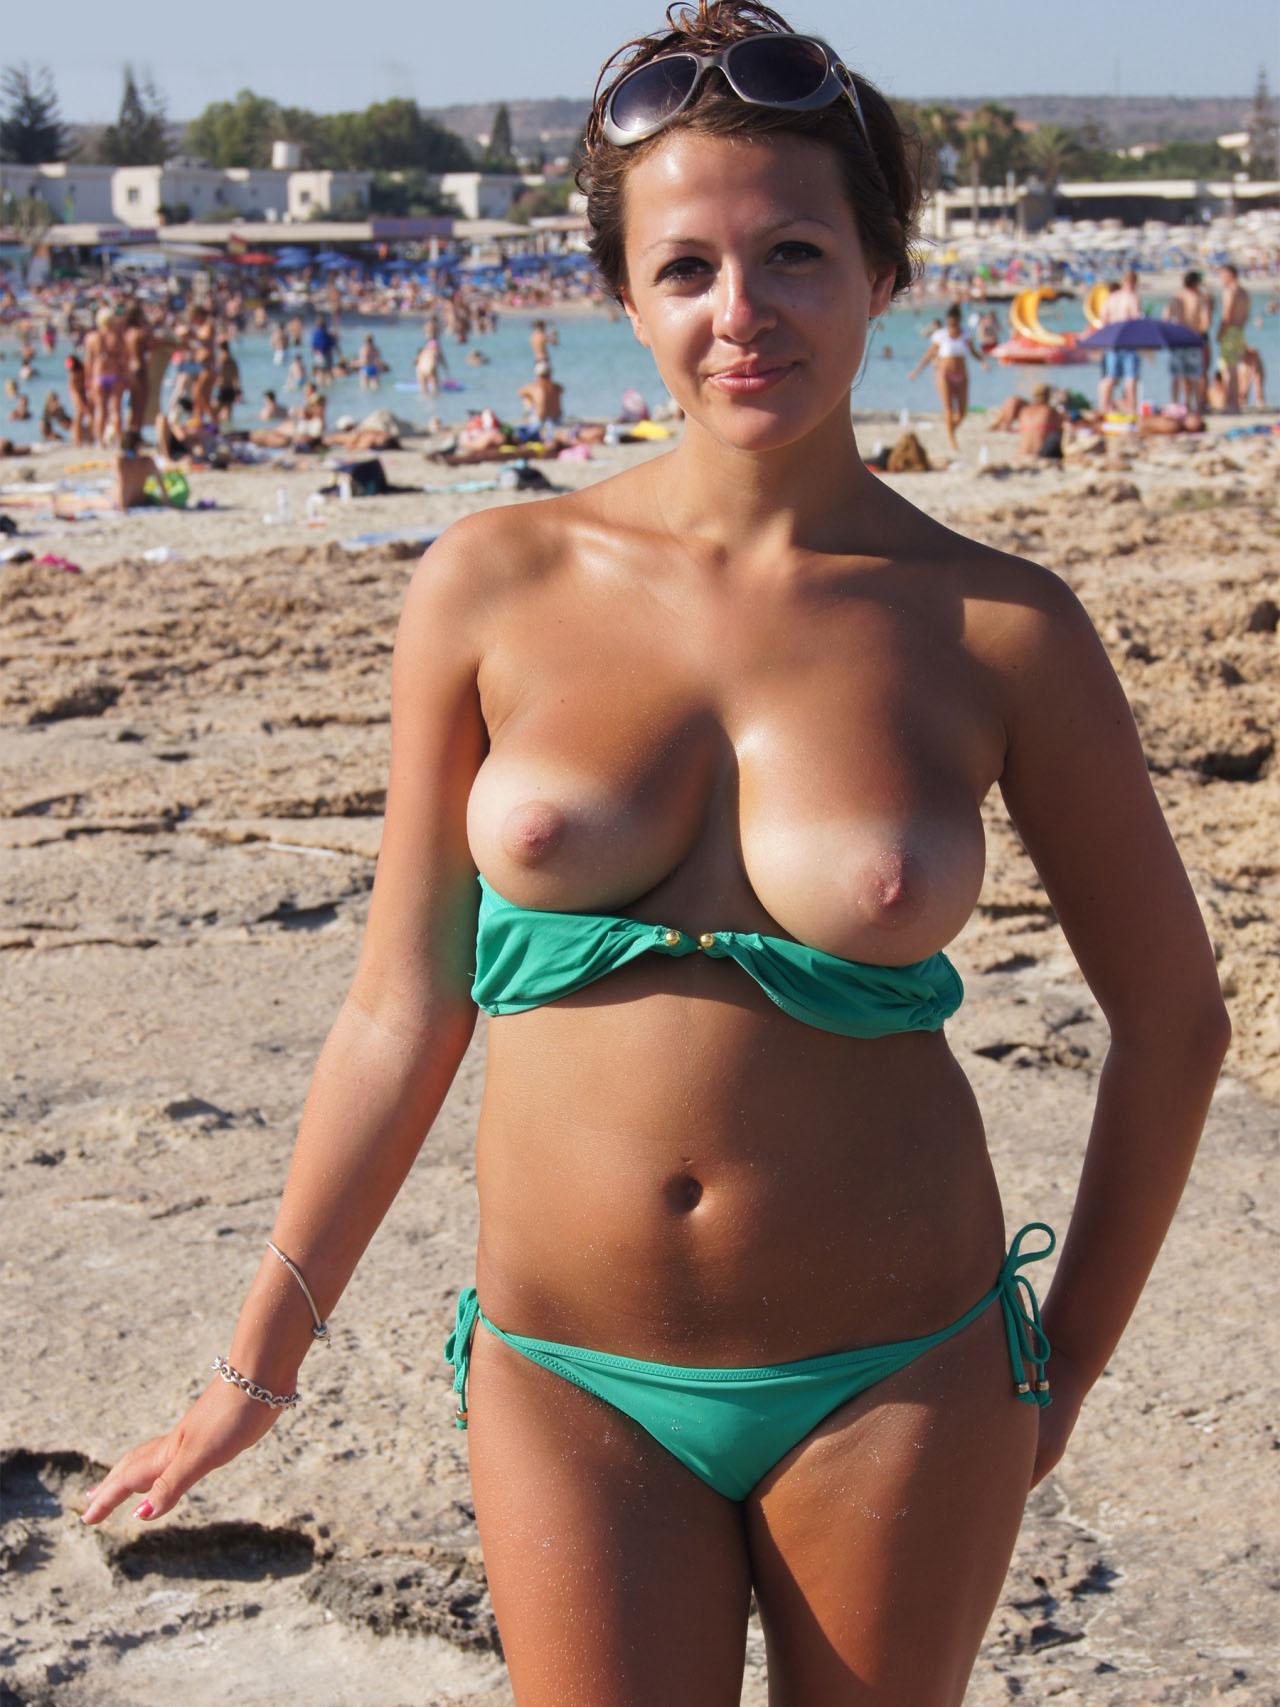 Average girls naked pics-5793